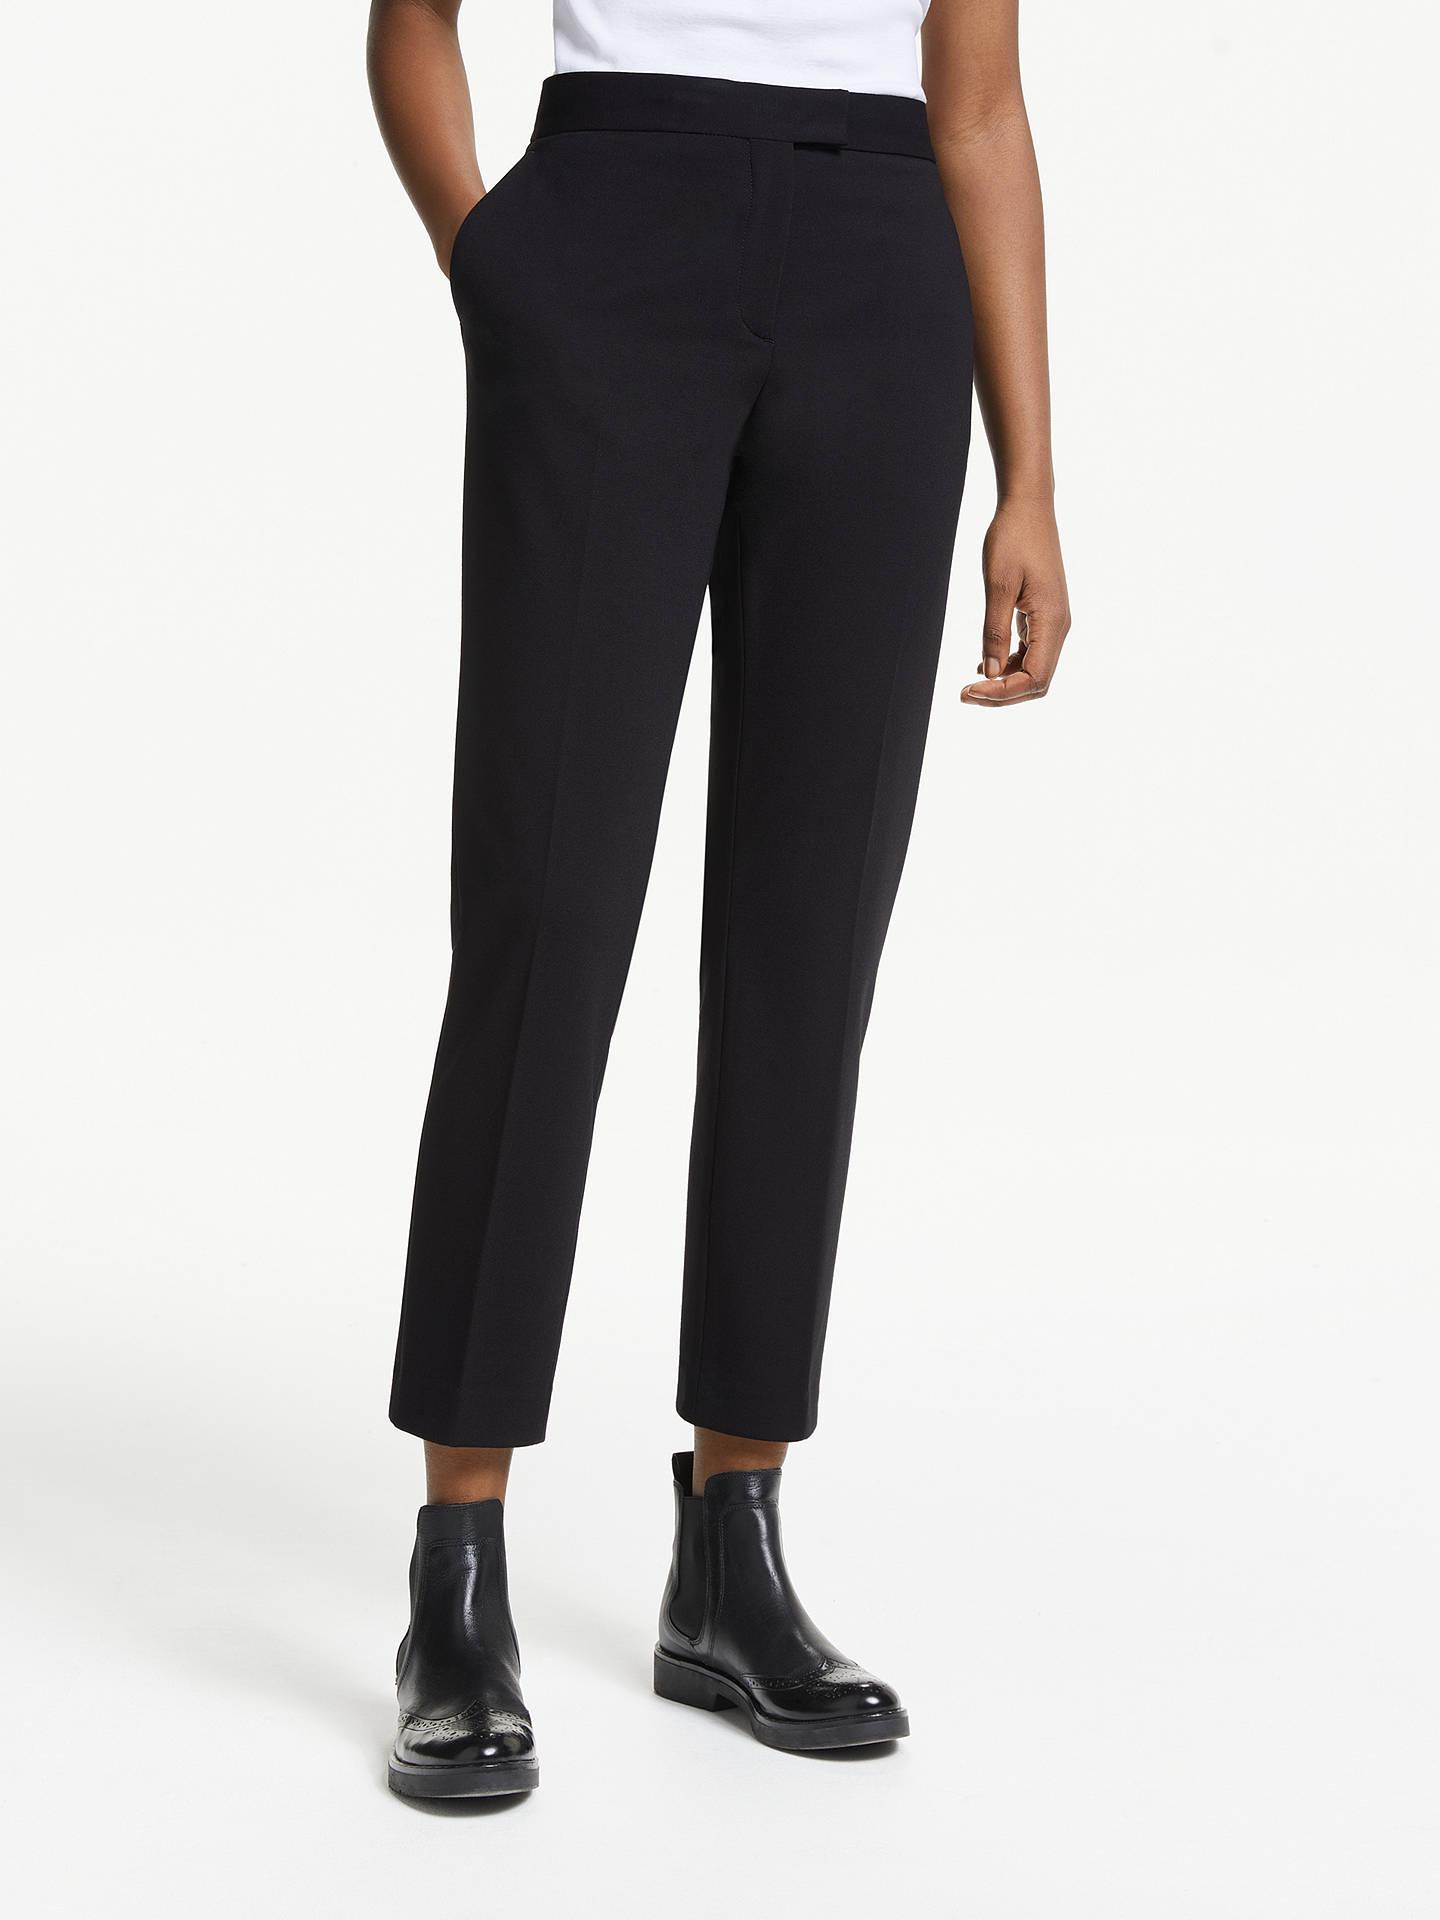 a0a2e9e1a0a329 Buy PS Paul Smith Milano Slim Leg Trousers, Black, 8 Online at johnlewis.